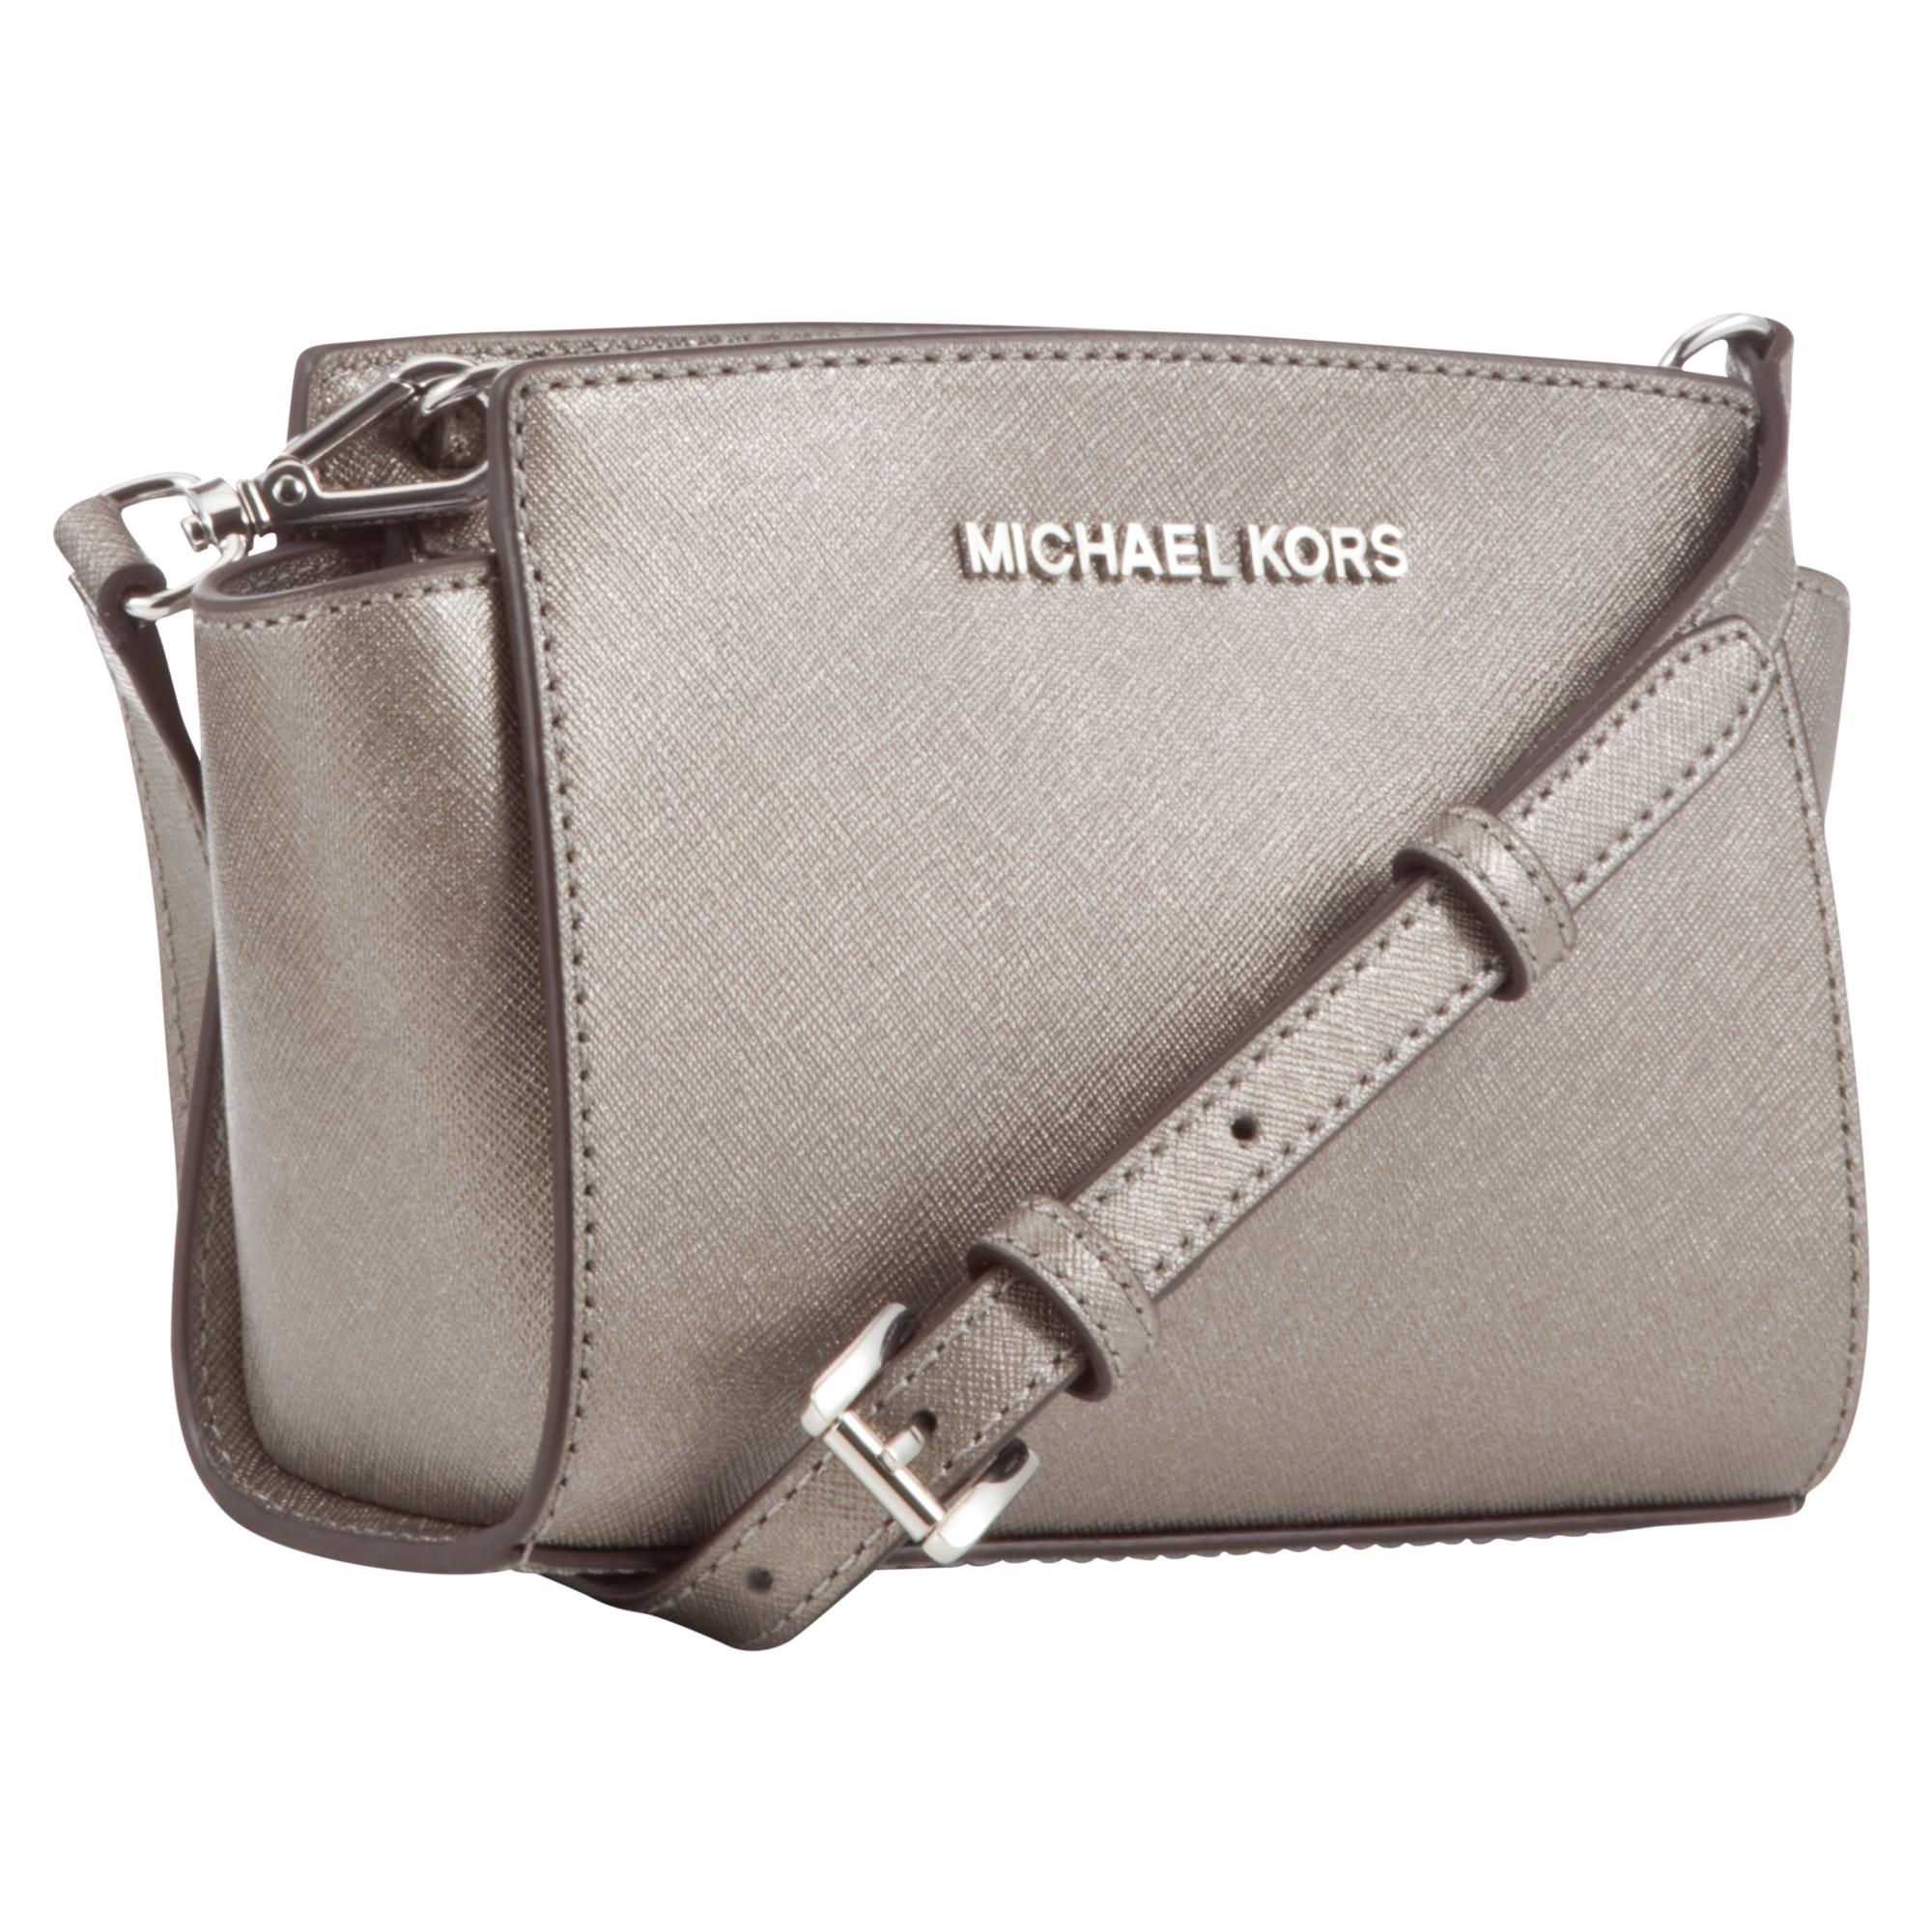 644740d2e428 MICHAEL Michael Kors Selma Saffiano Leather Mini Messenger Bag in ...